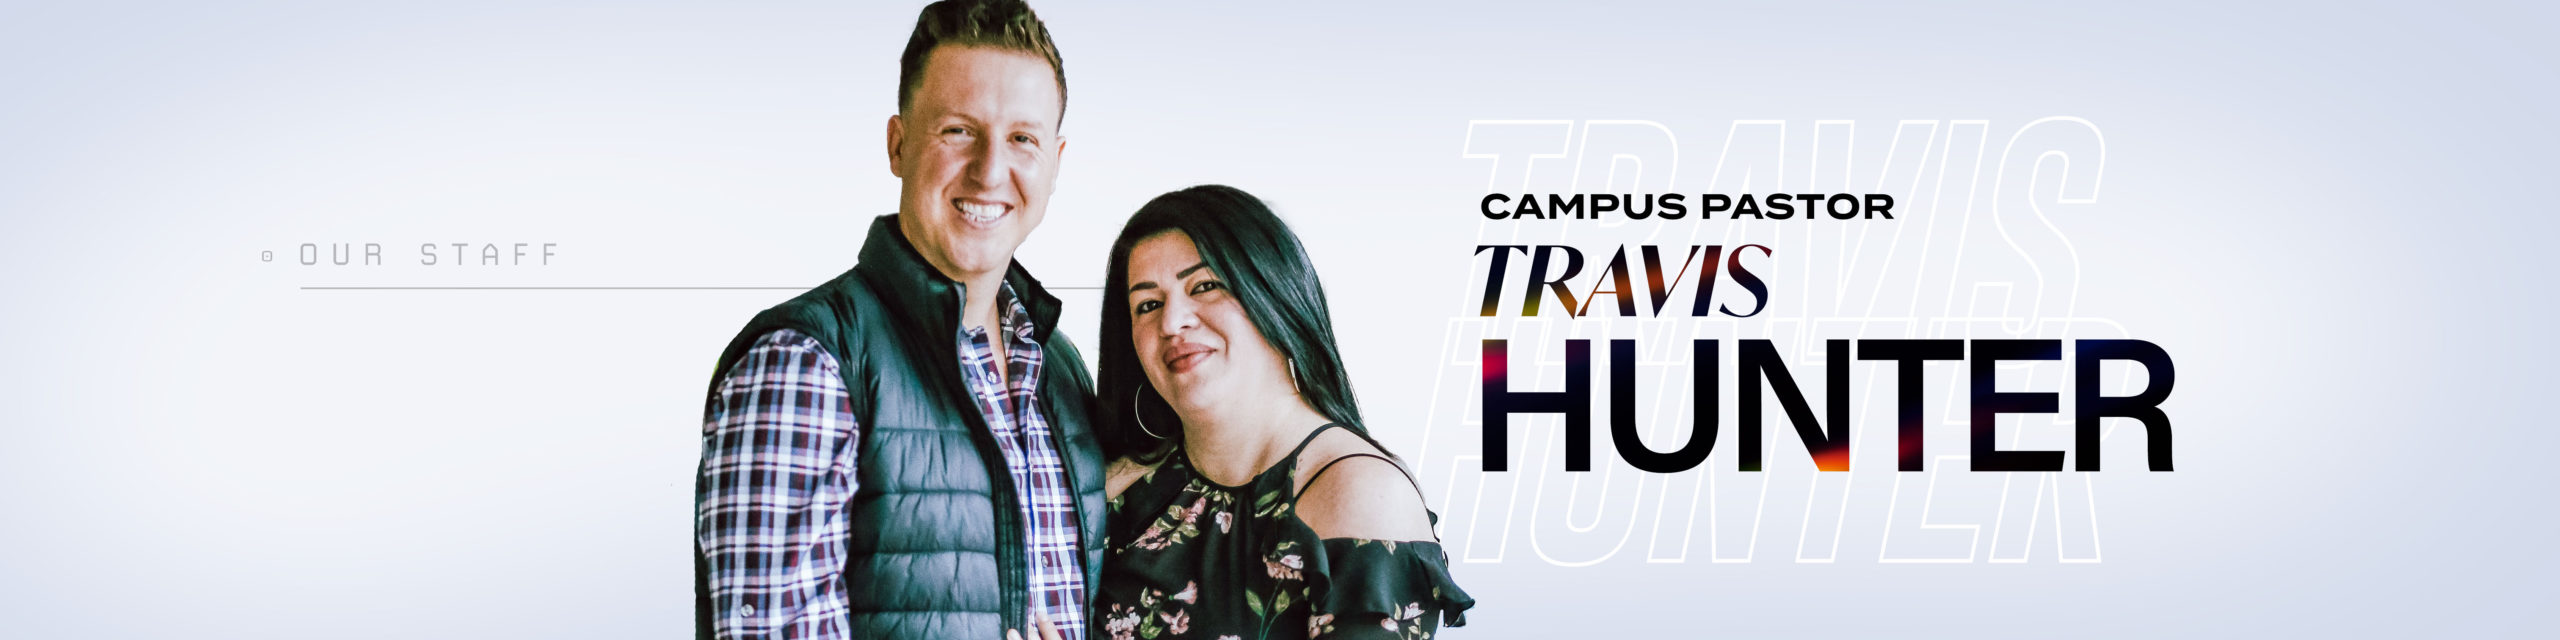 Travis Hunter - Campus Pastor of Nations Church Orlando